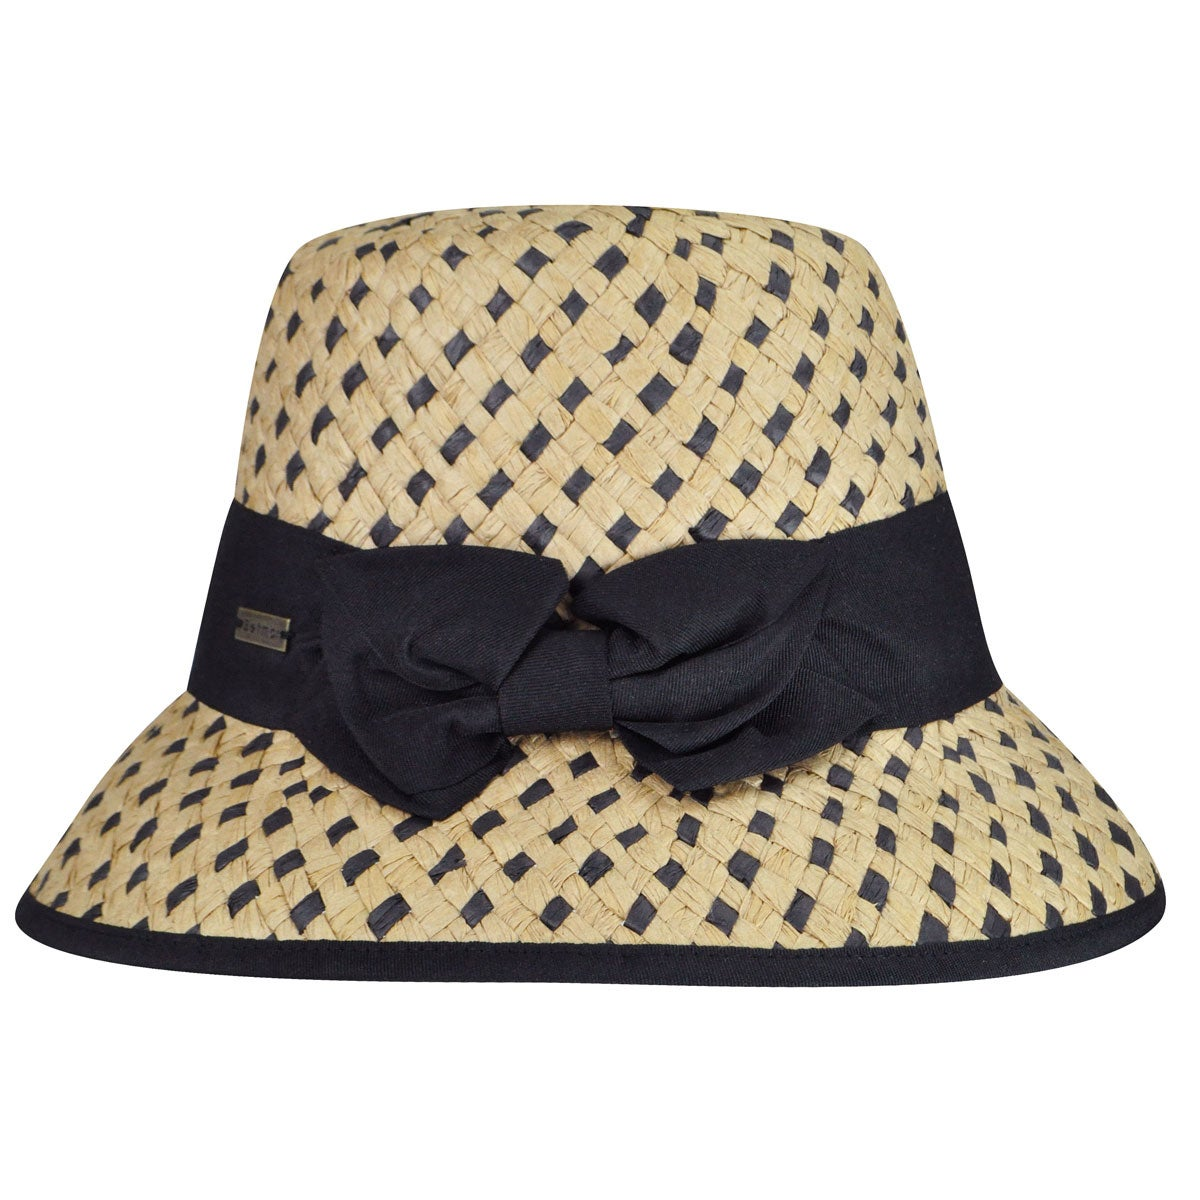 Betmar Bridgitte Bucket Hat in Natural,Black